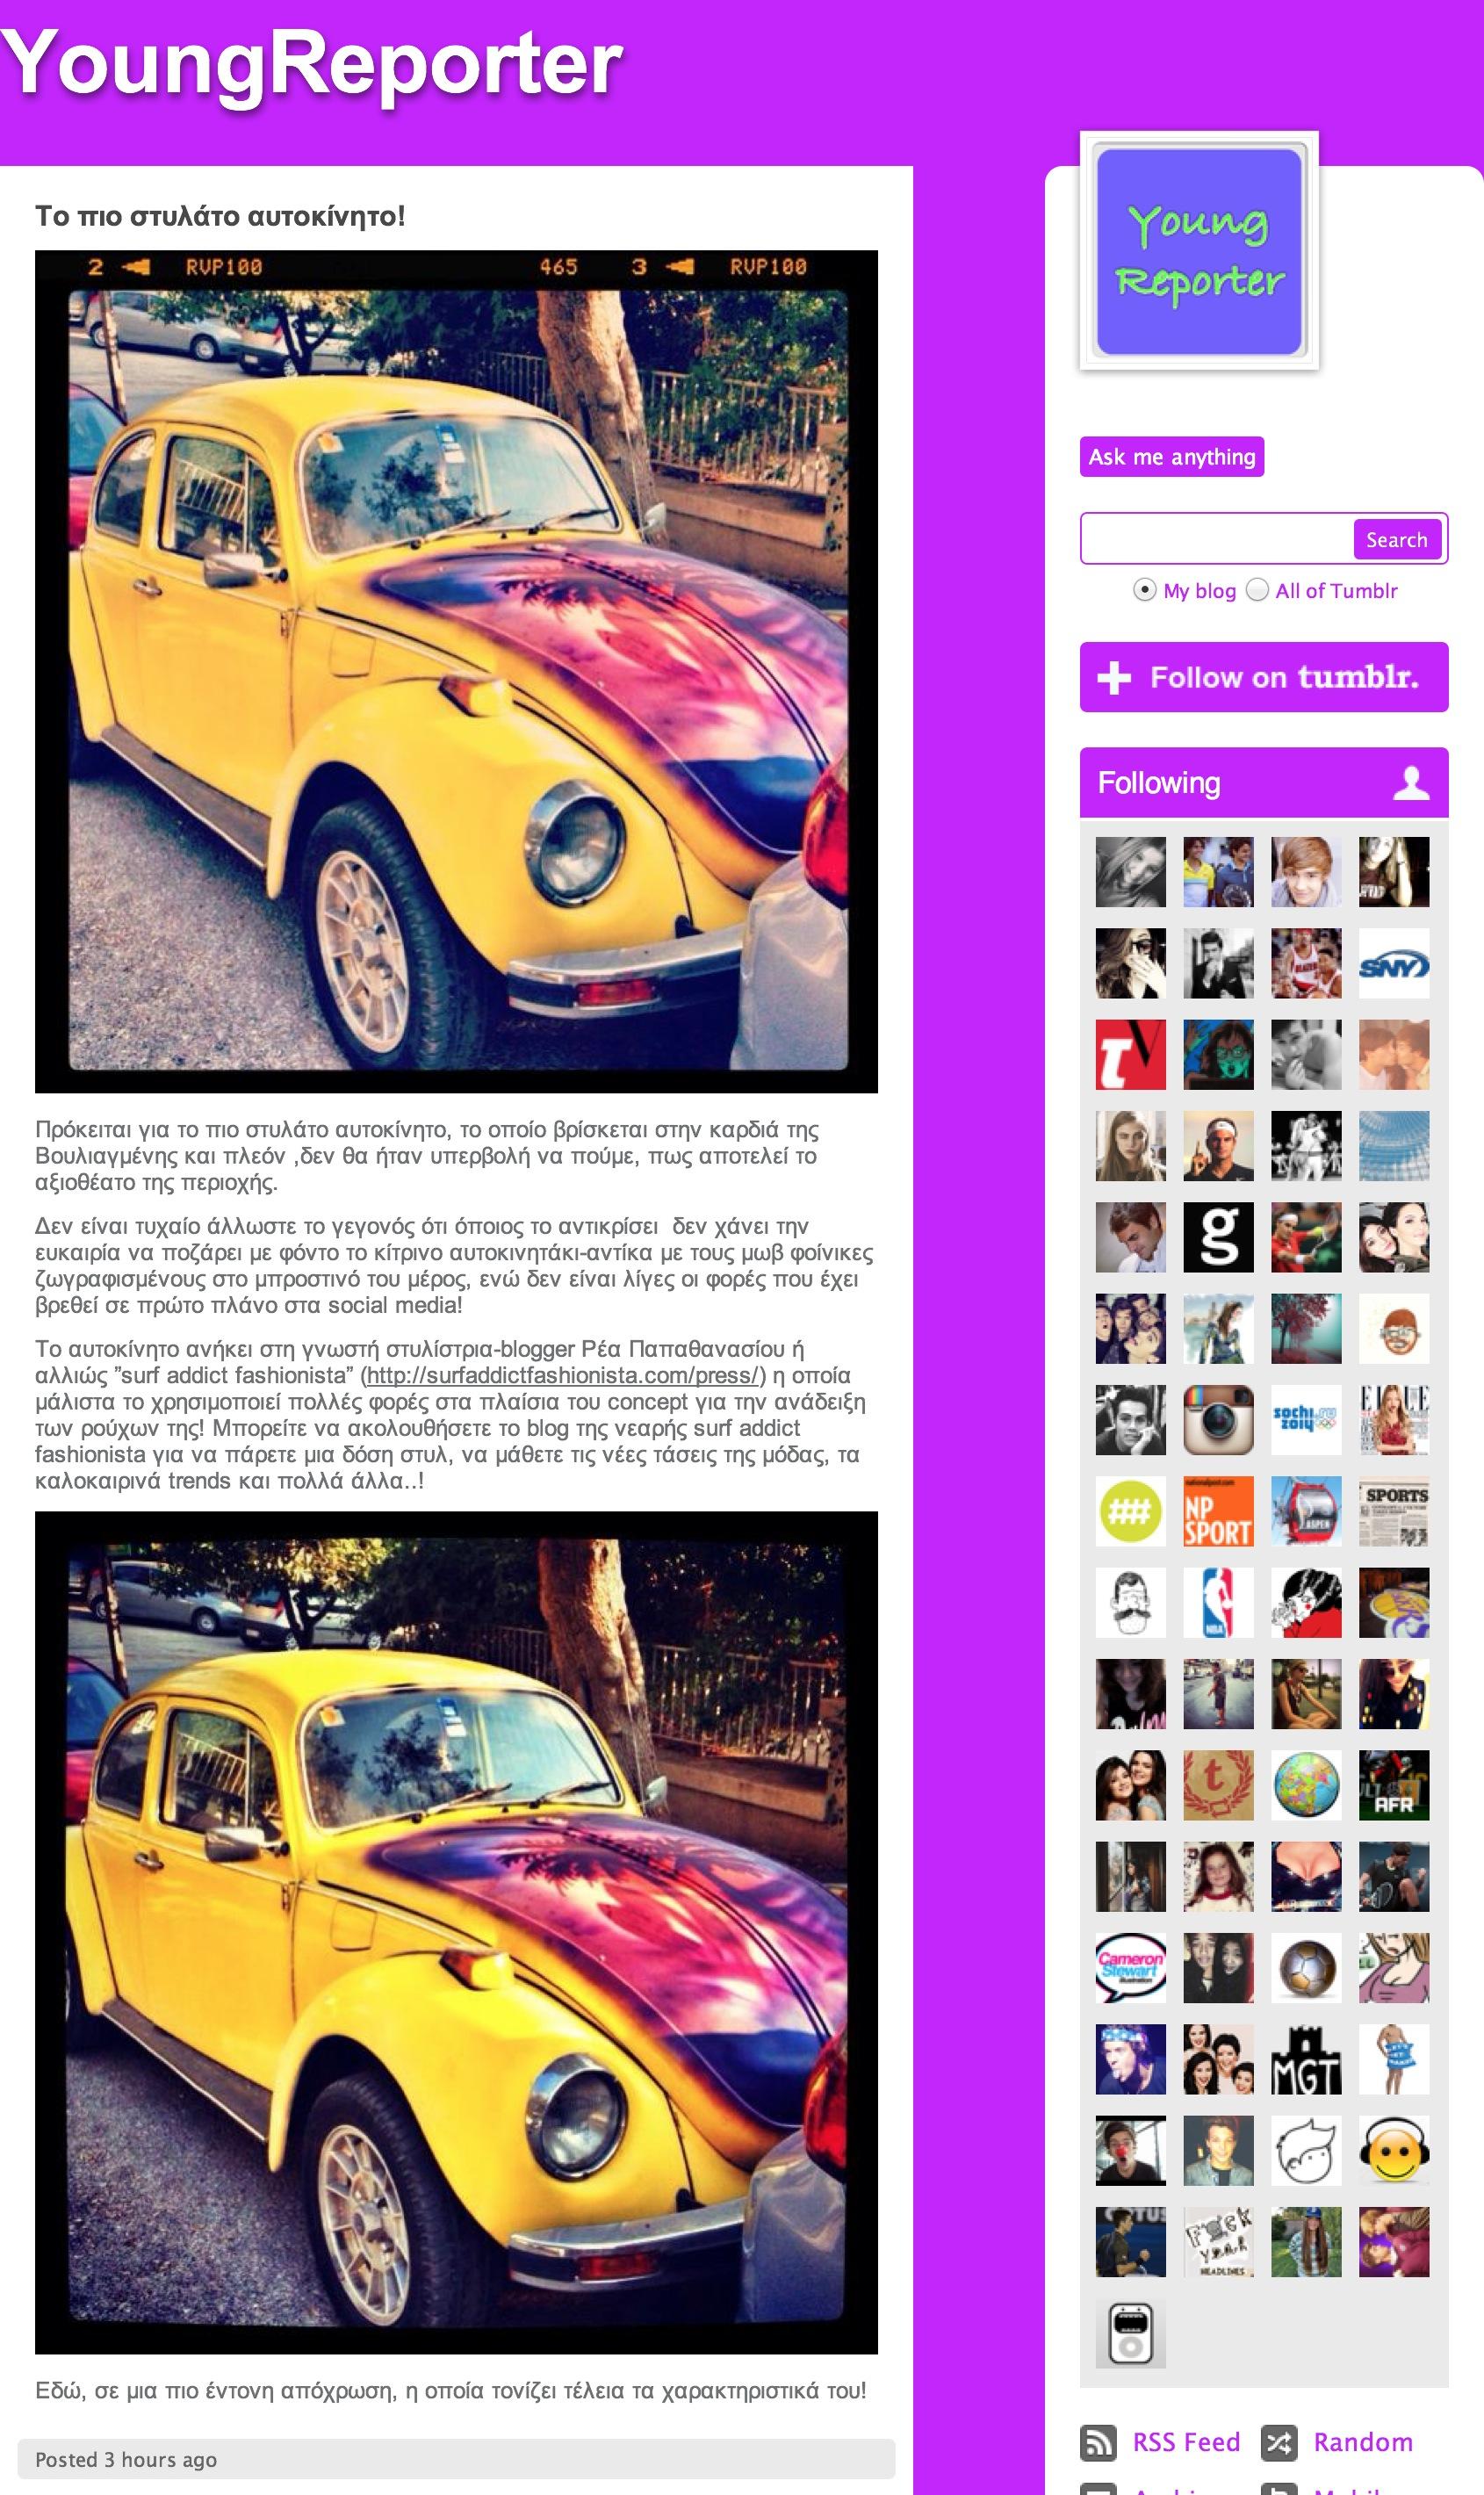 YoungReporter, Το πιο στυλάτο αυτοκίνητο! (20130921).jpg